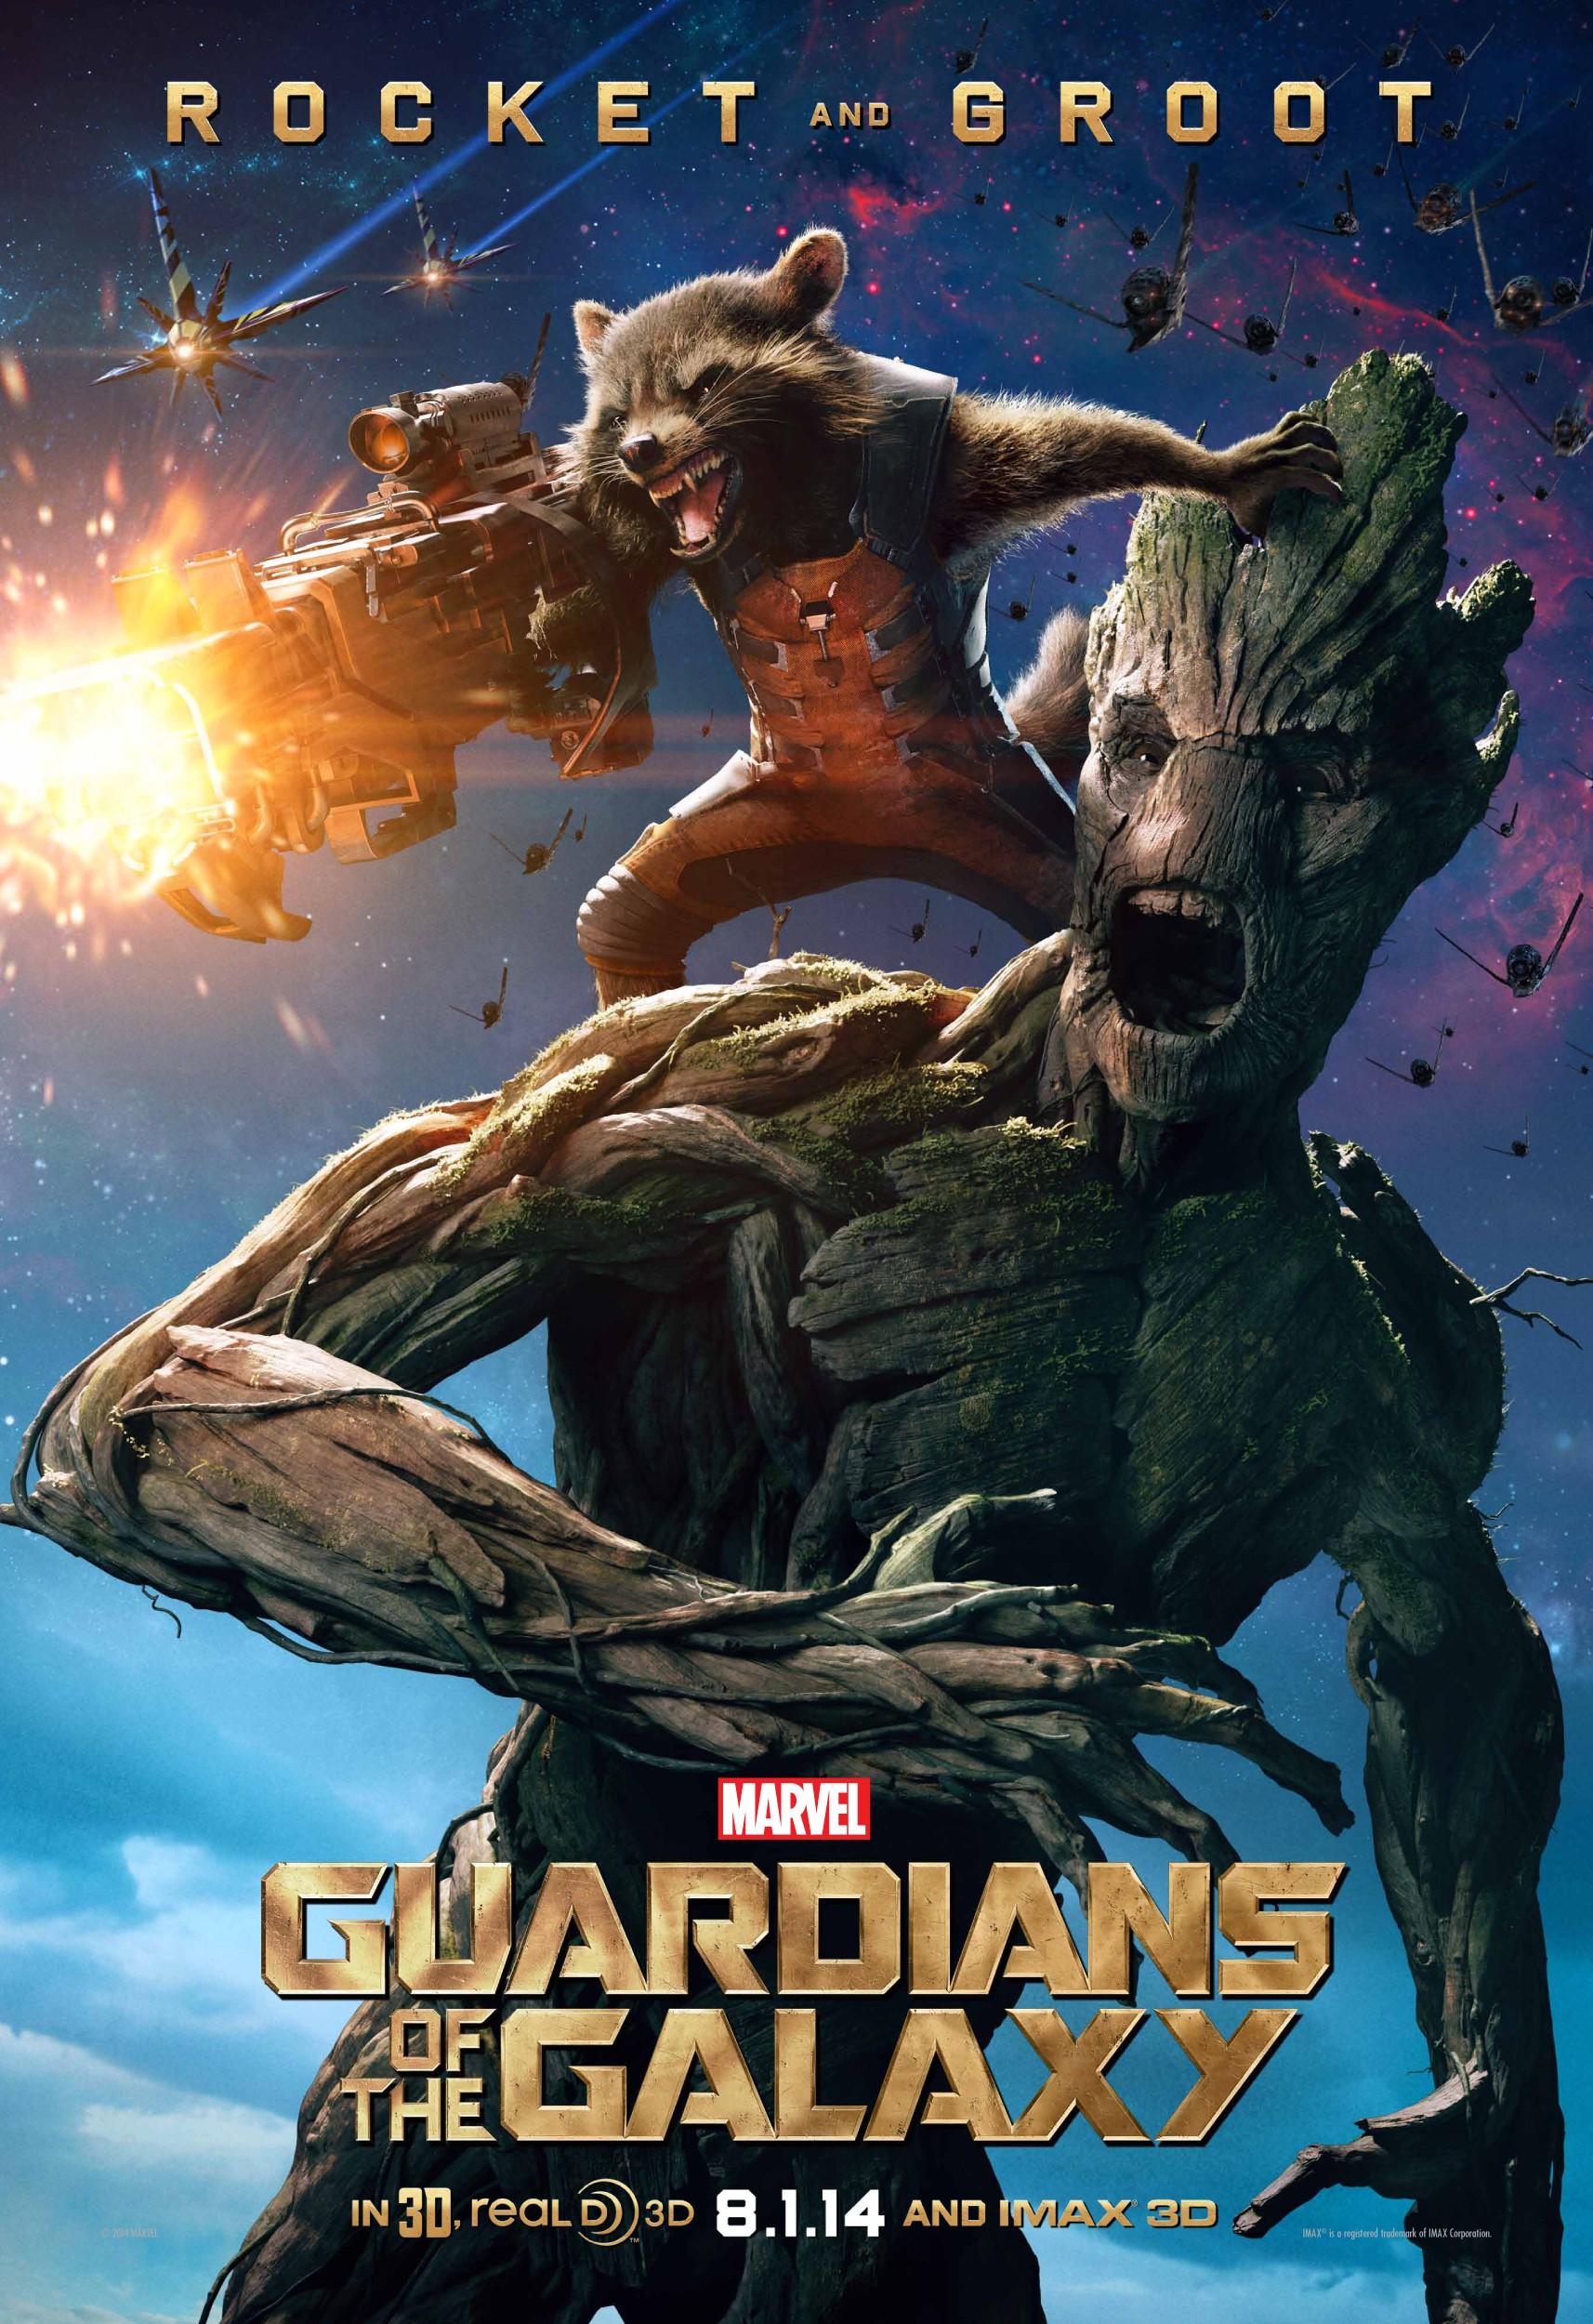 плакат фильма характер-постер Стражи Галактики